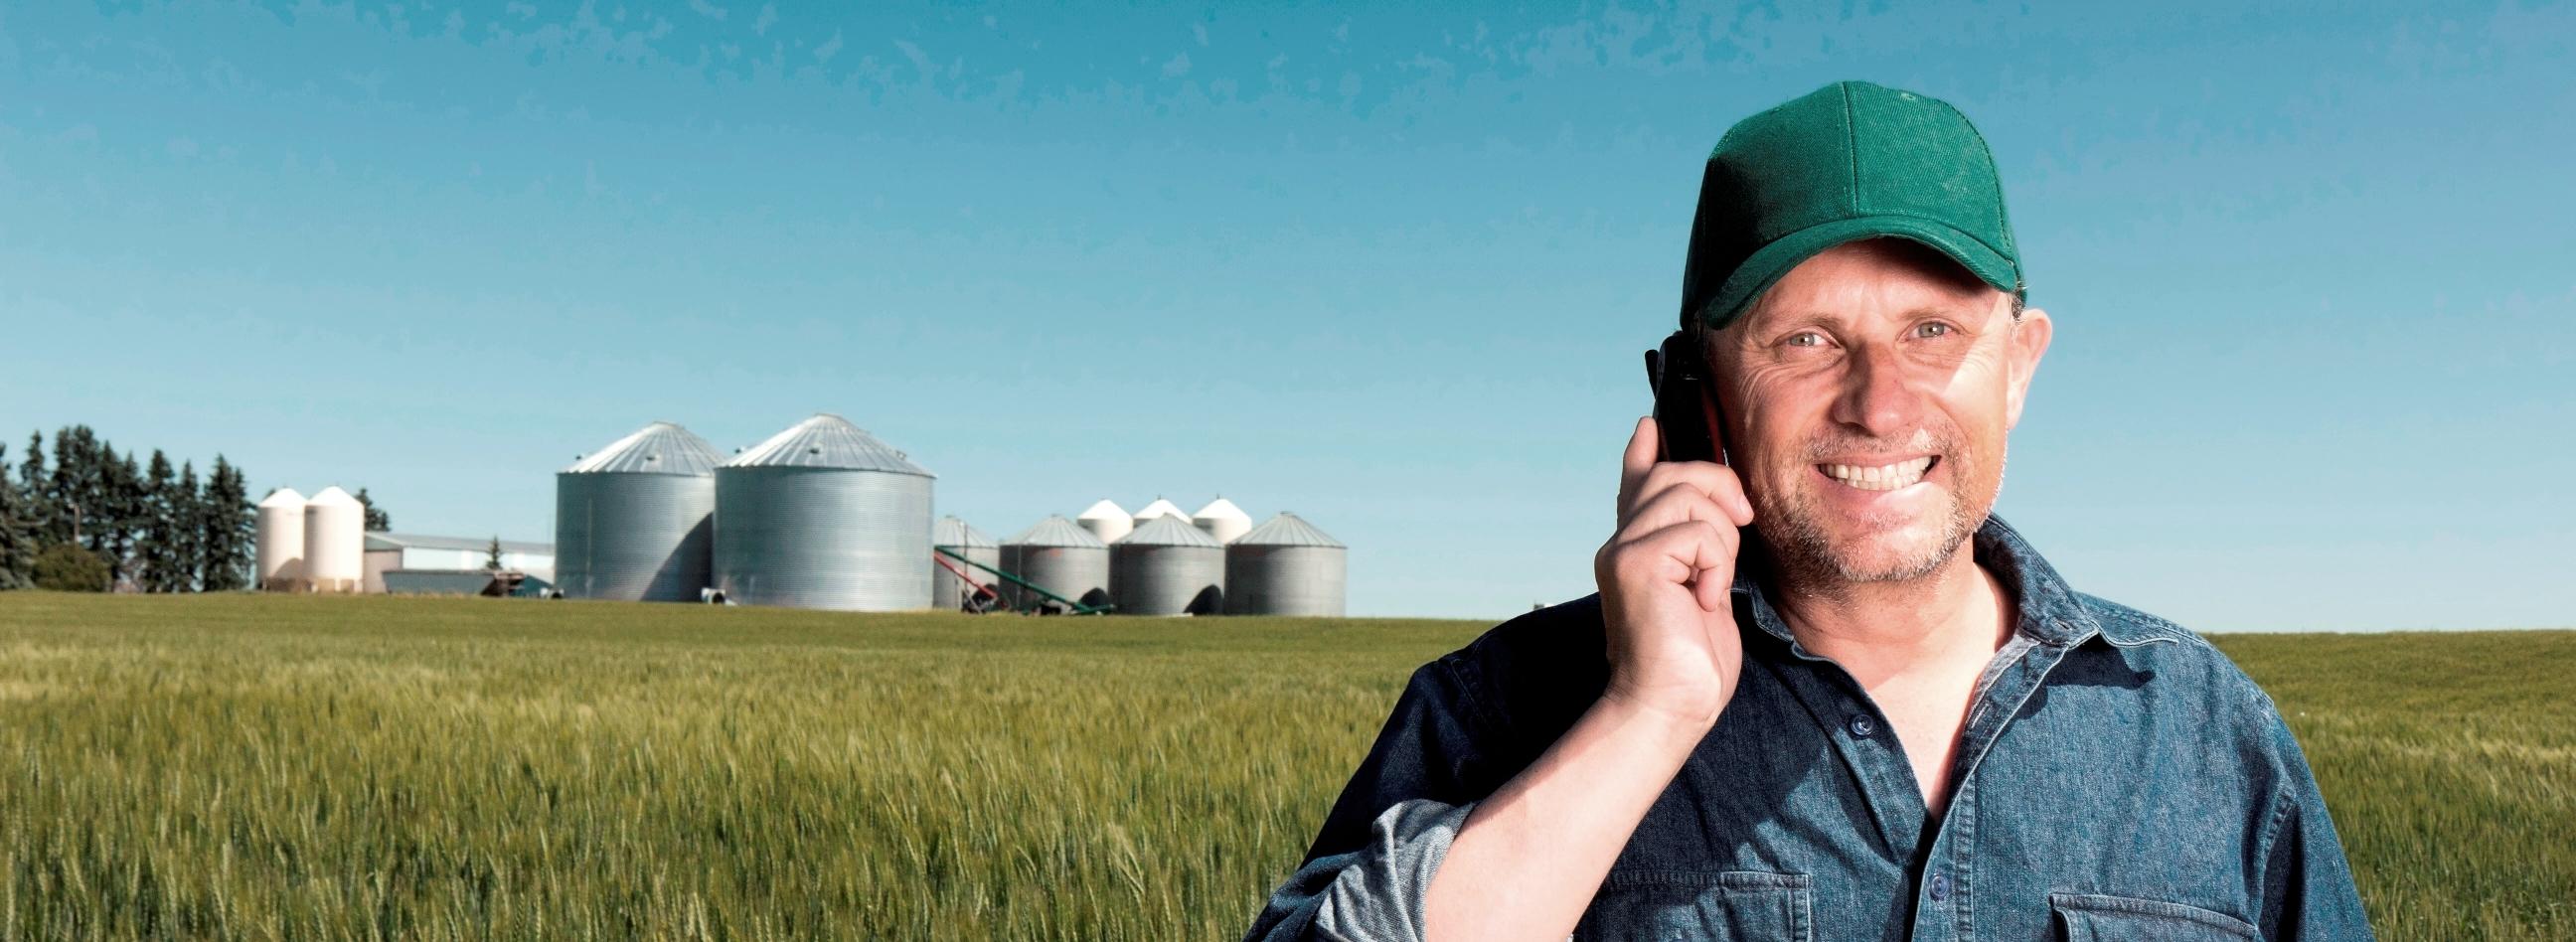 Farm-Equipment-Financing-Programs-1